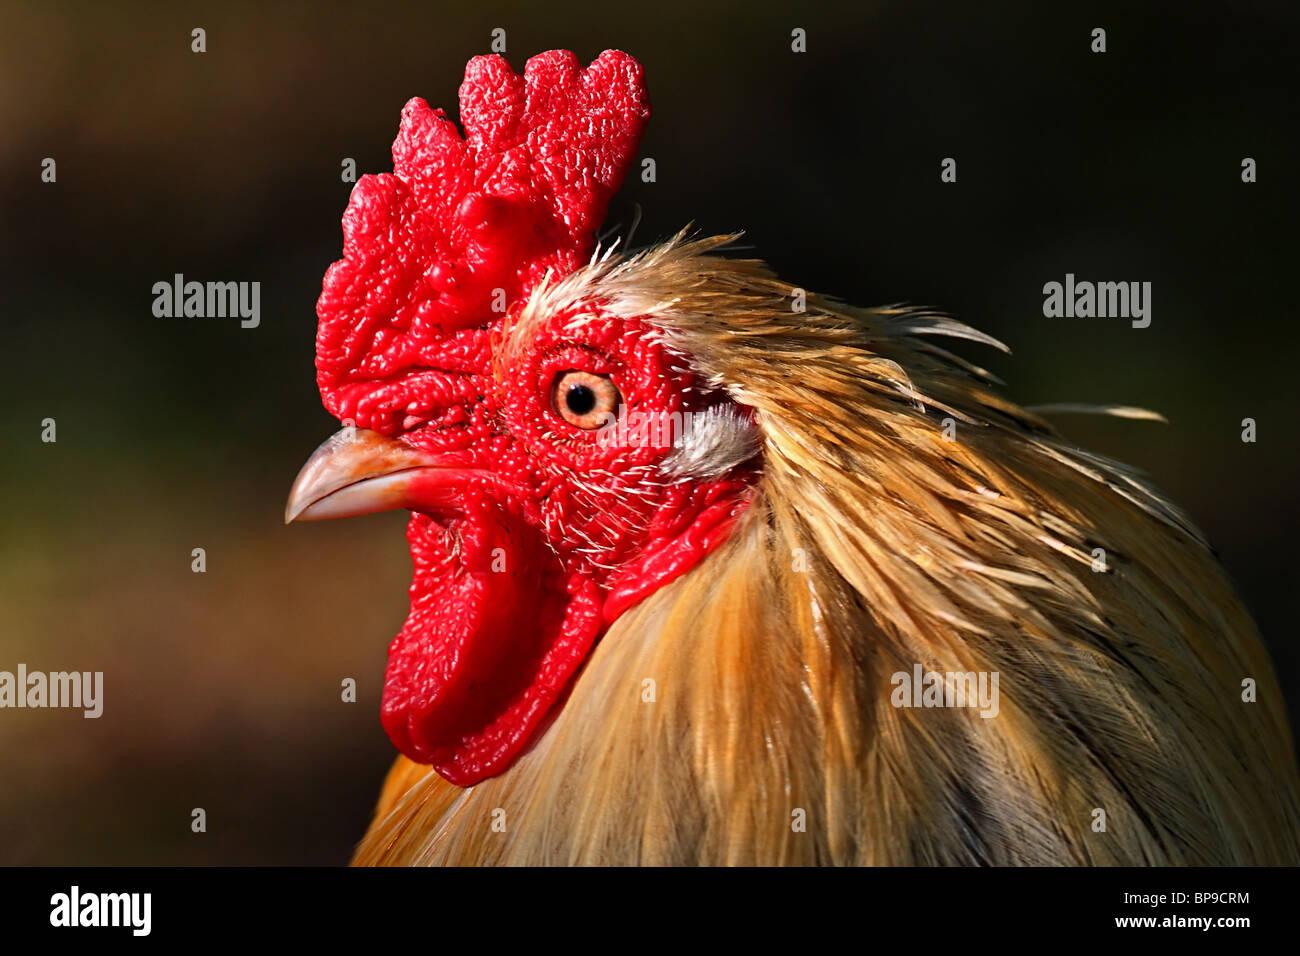 Cockerel Rhode Island Red chicken Gallus gallus domesticus - Stock Image